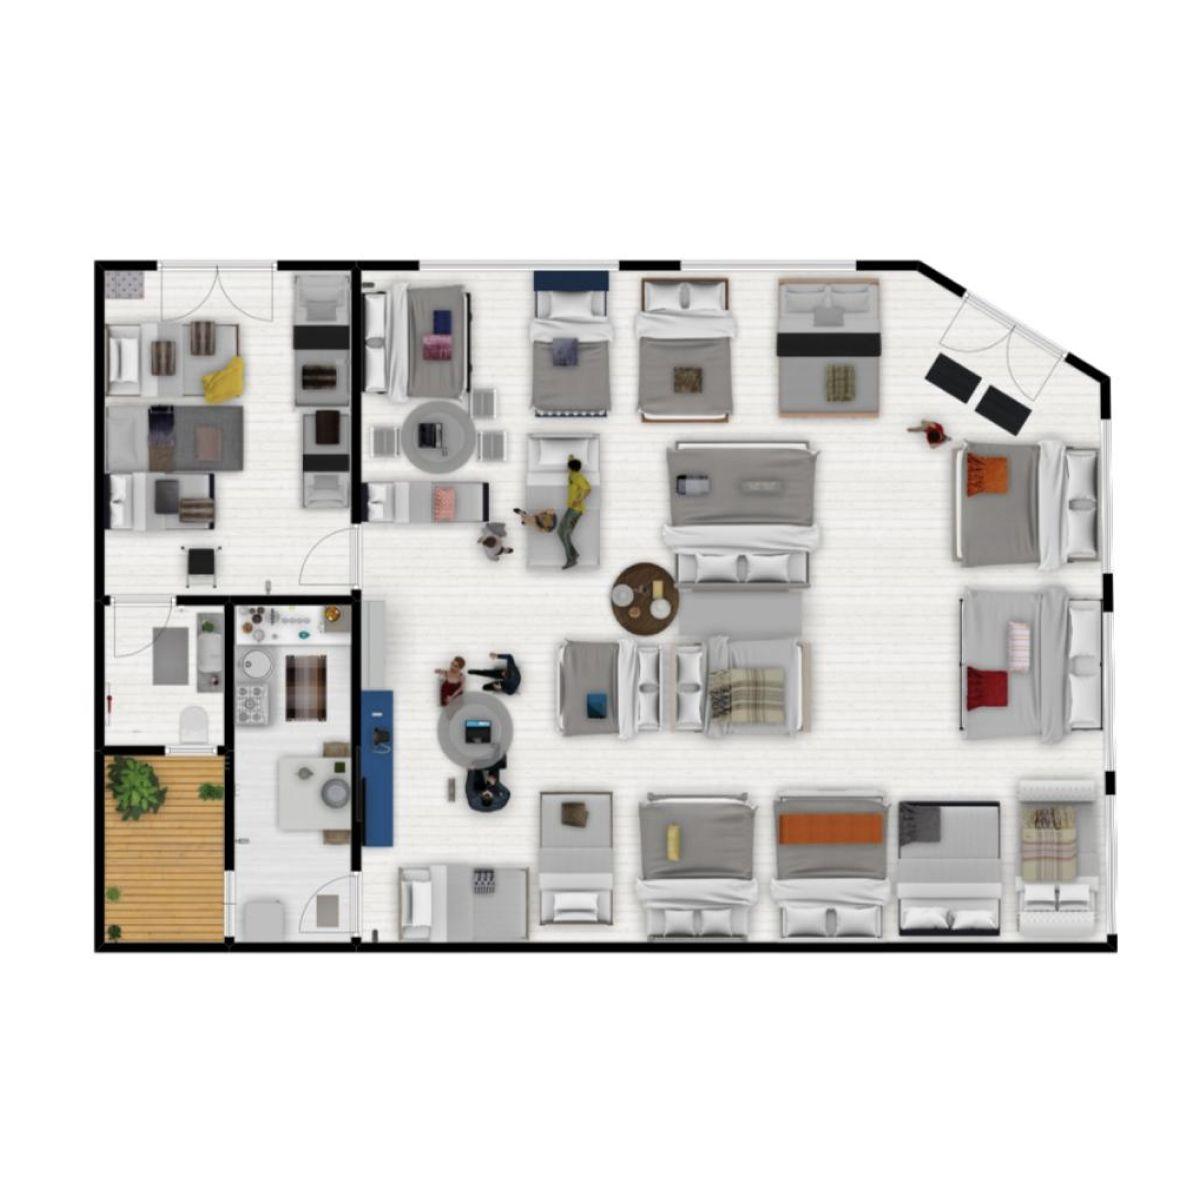 Mattress Shop Layout Made On Floorplanner Com Create Floor Plan Shop Layout Floor Plans